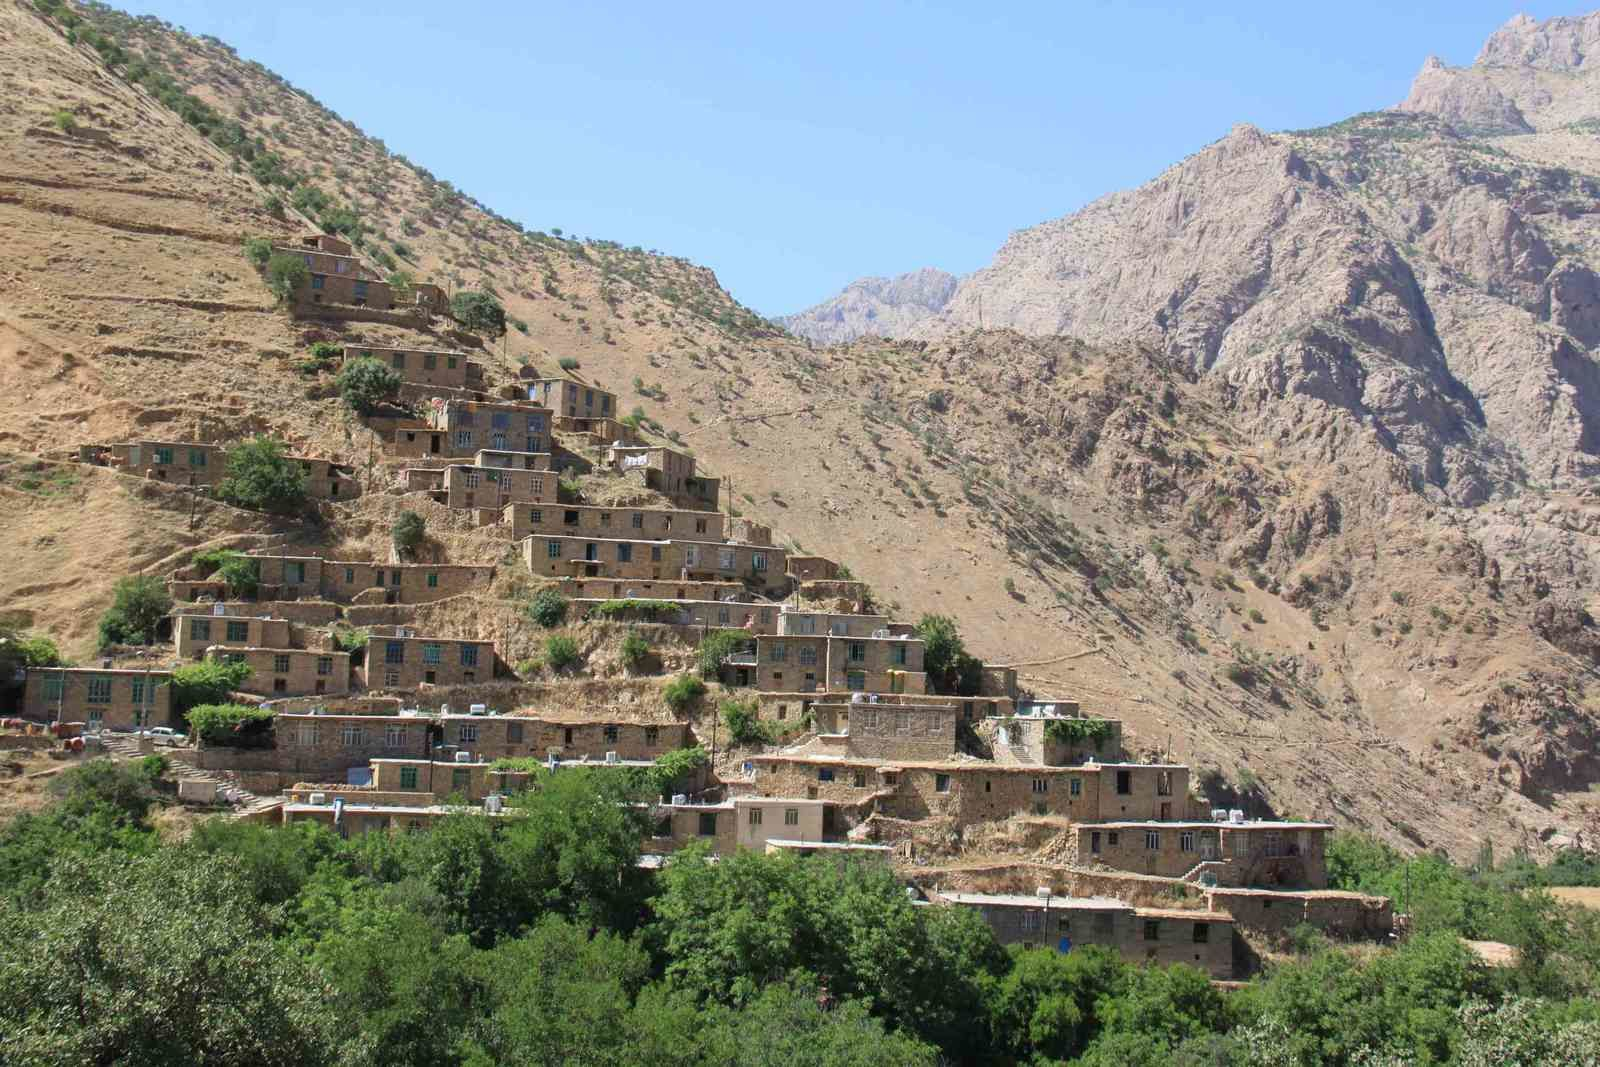 Magnifique Kurdistan iranien !